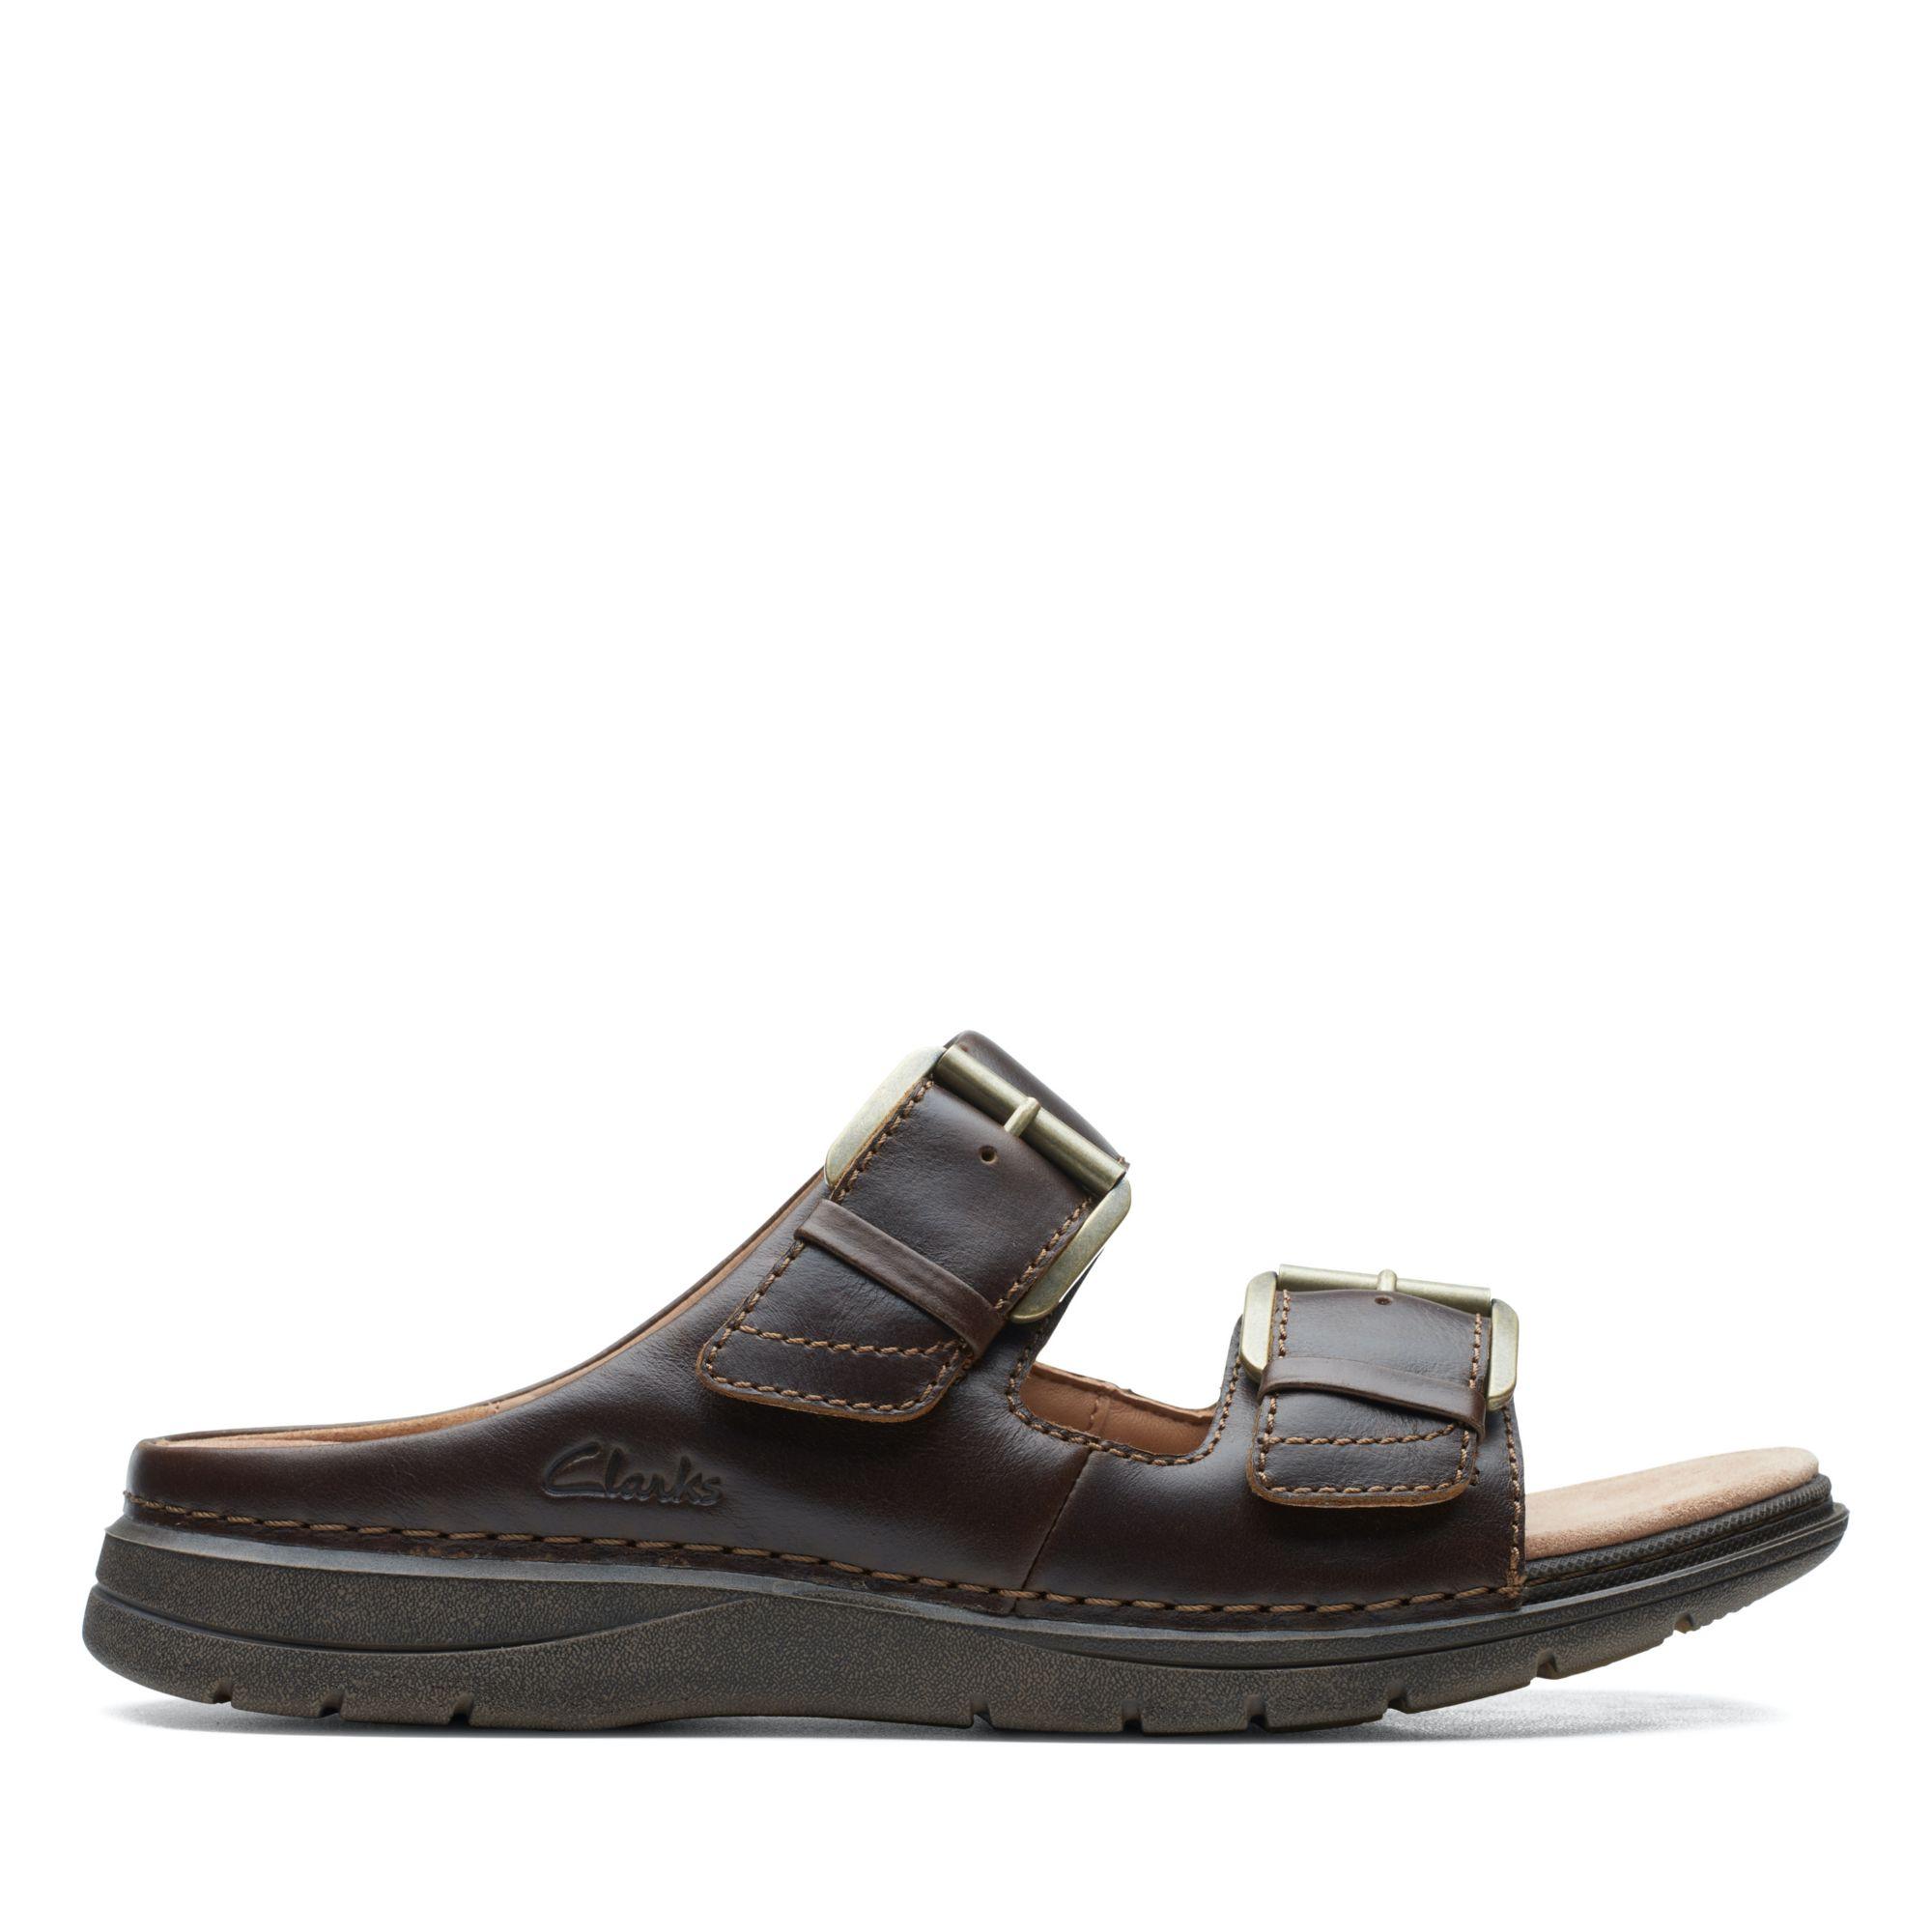 Clarks-UN自然家族-Nature Vibe摩鬼氈設計拖鞋(棕褐色)